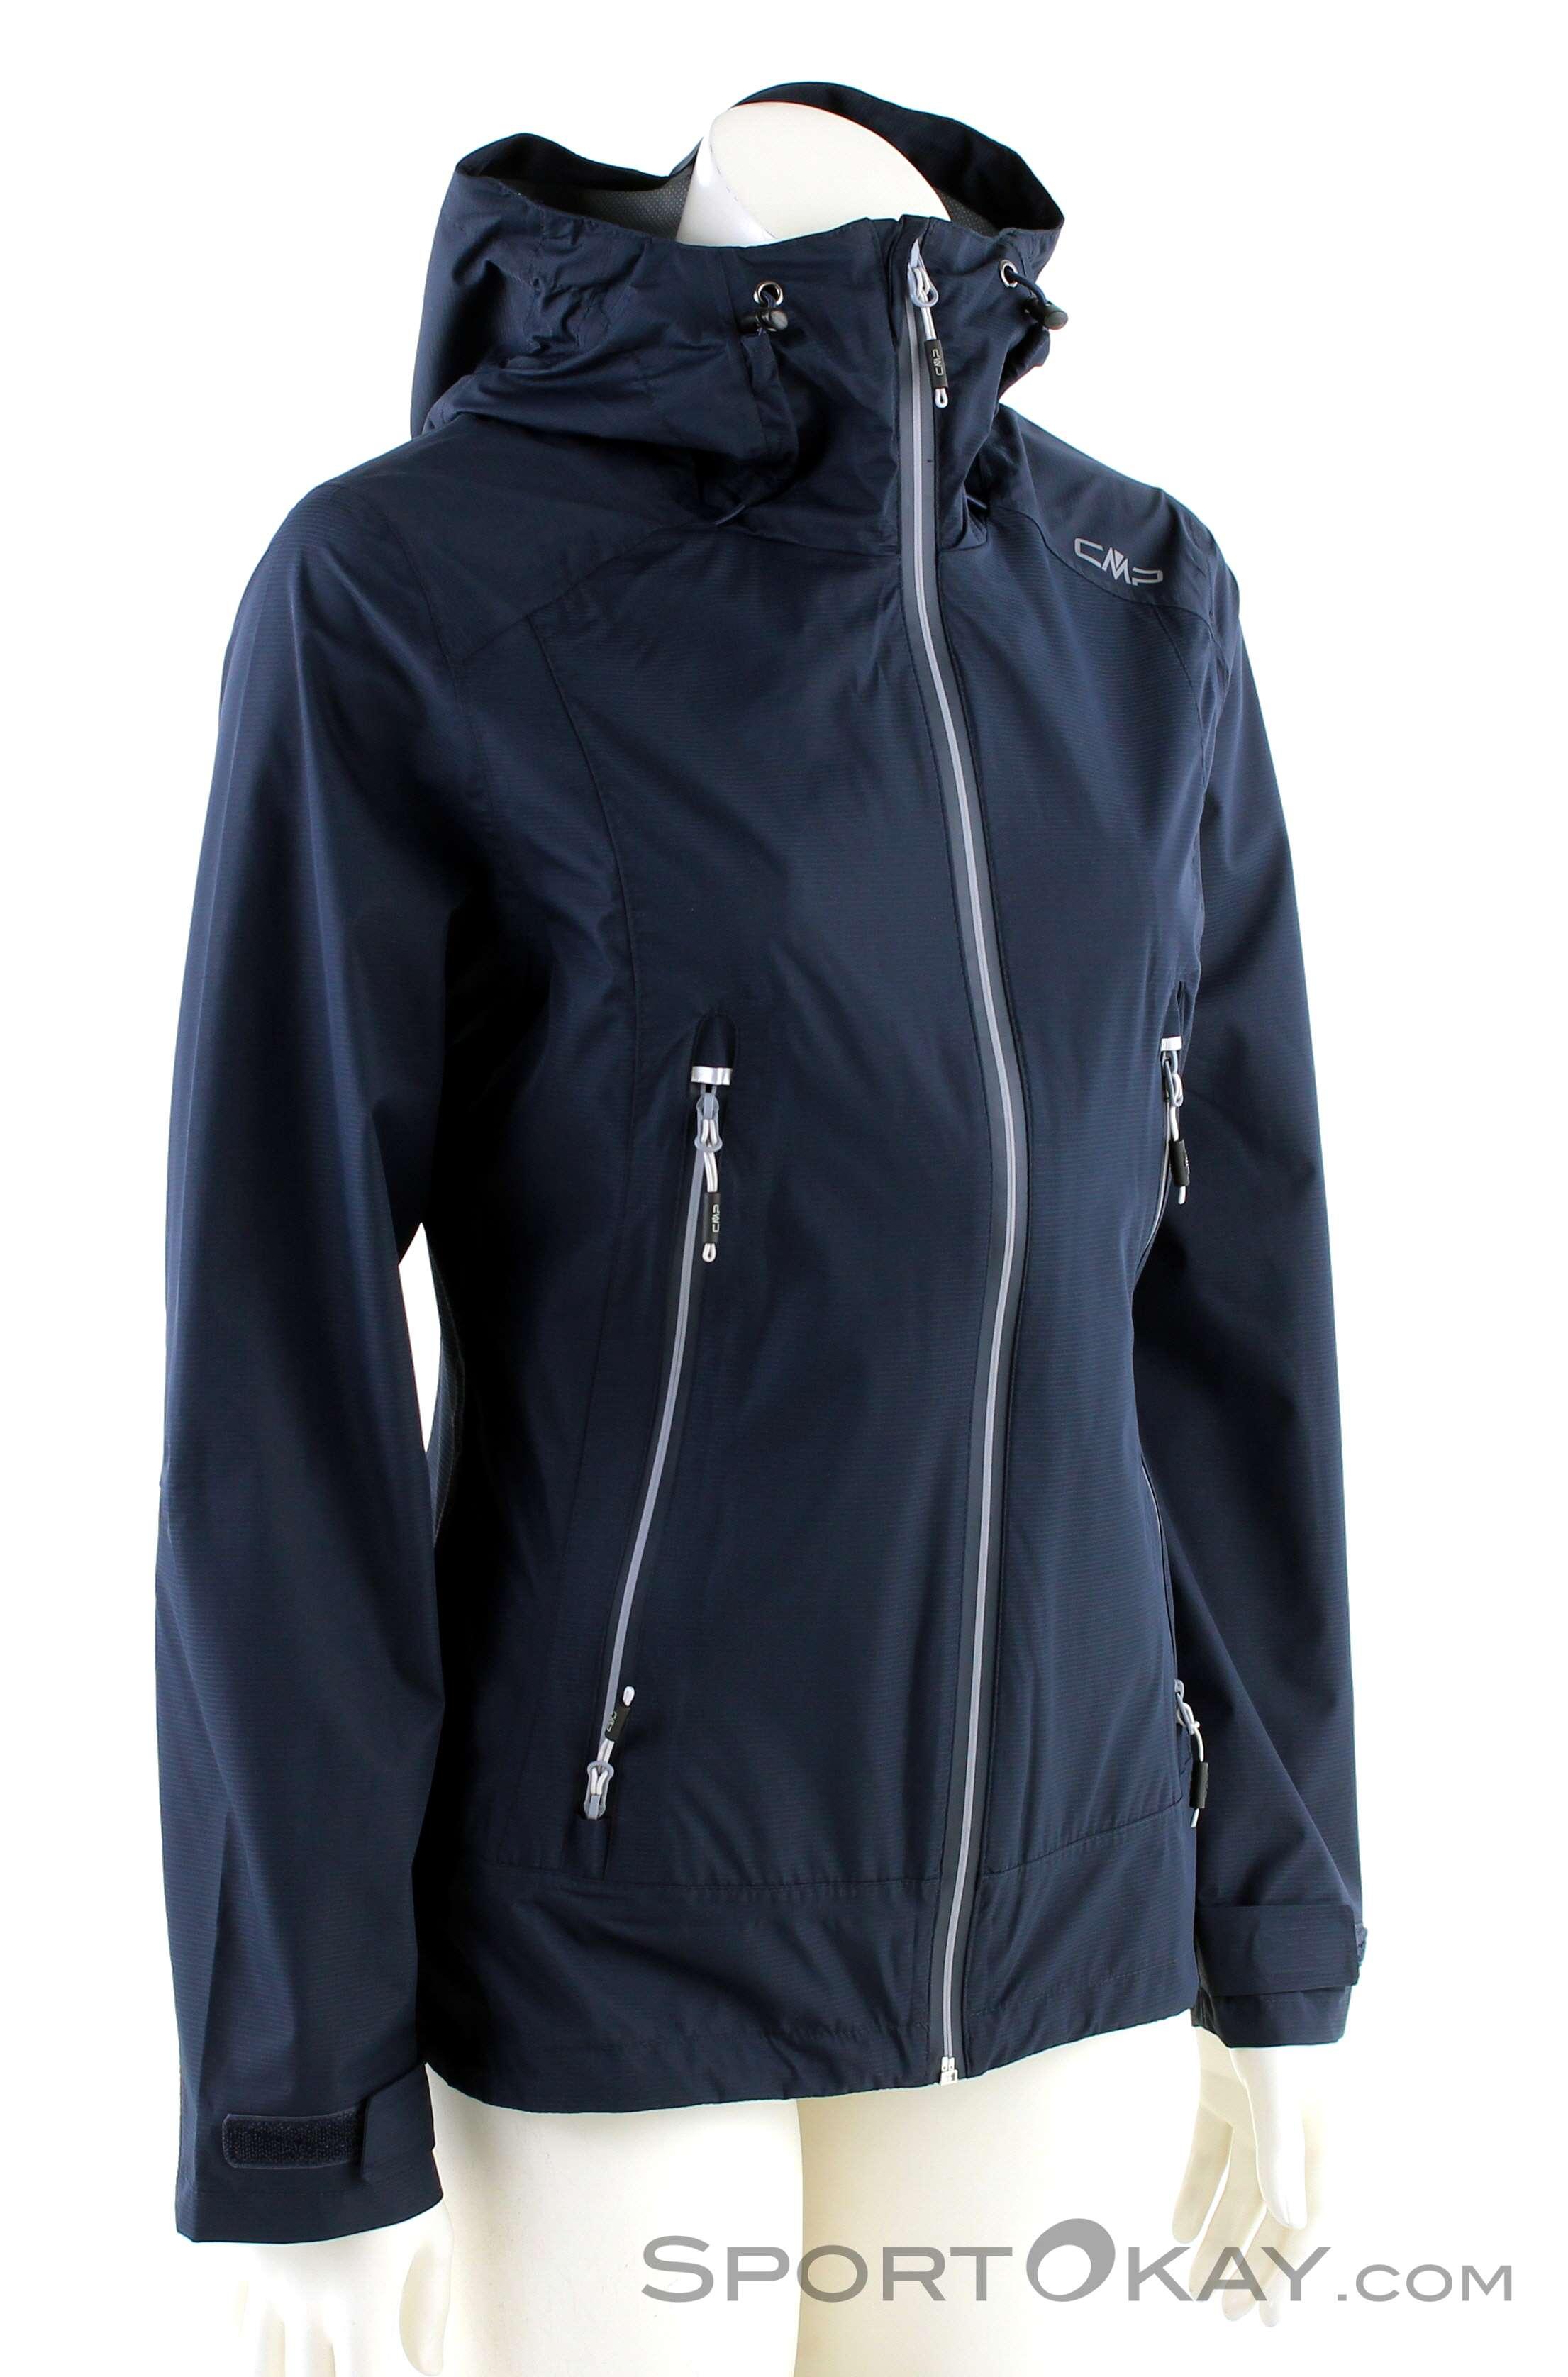 Outdoorjacke Cmp Fix Hood Damen Jacket TkZOPXiu